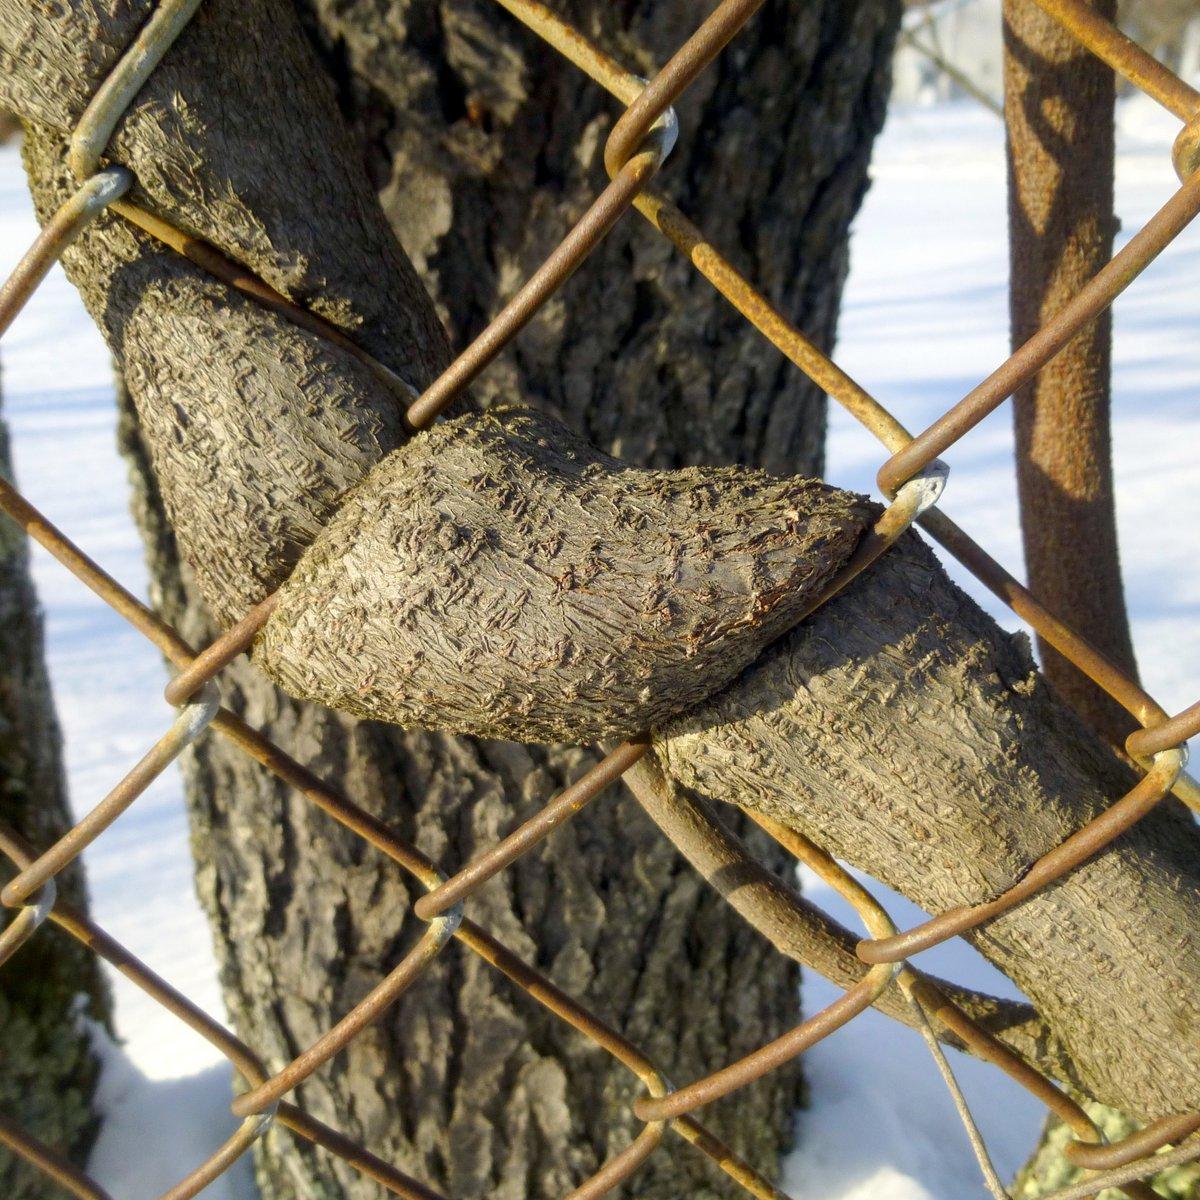 9. Wisteria in Fence